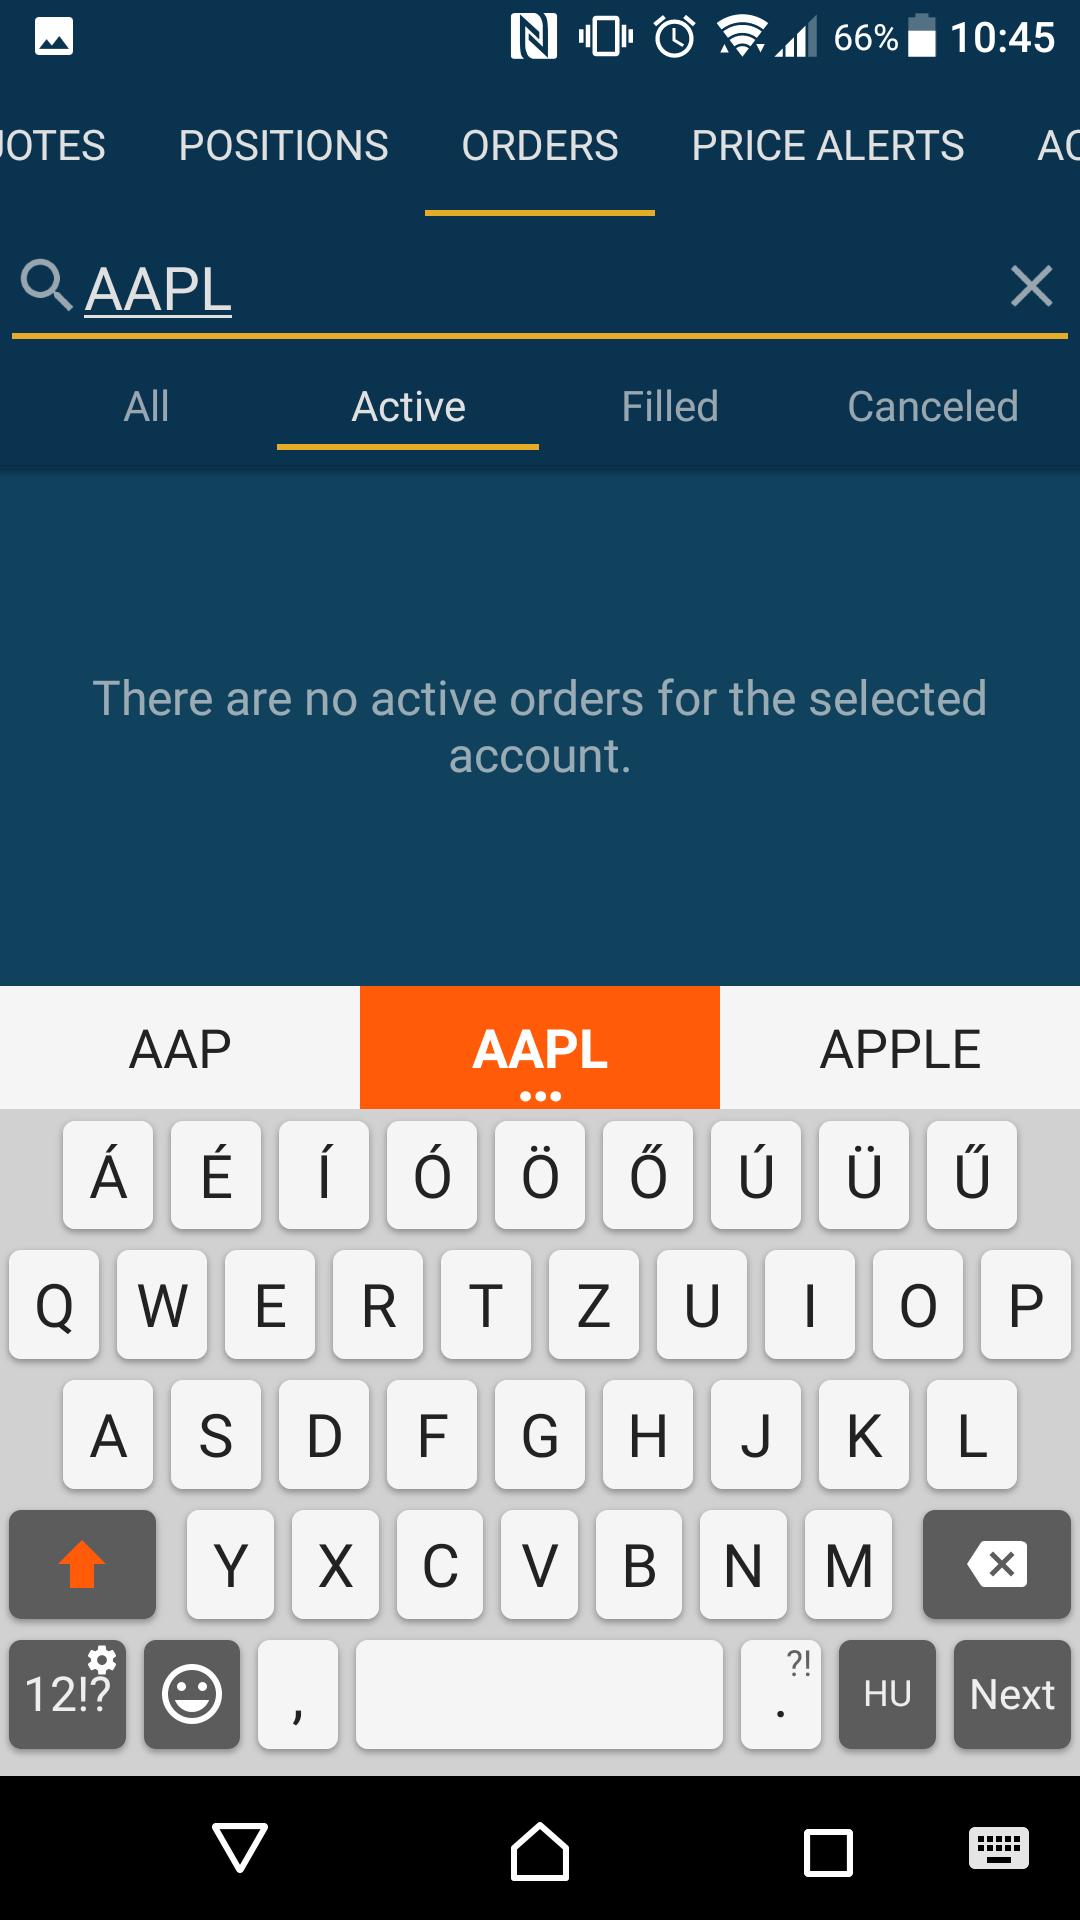 SogoTrade review - Mobile trading platform - Search